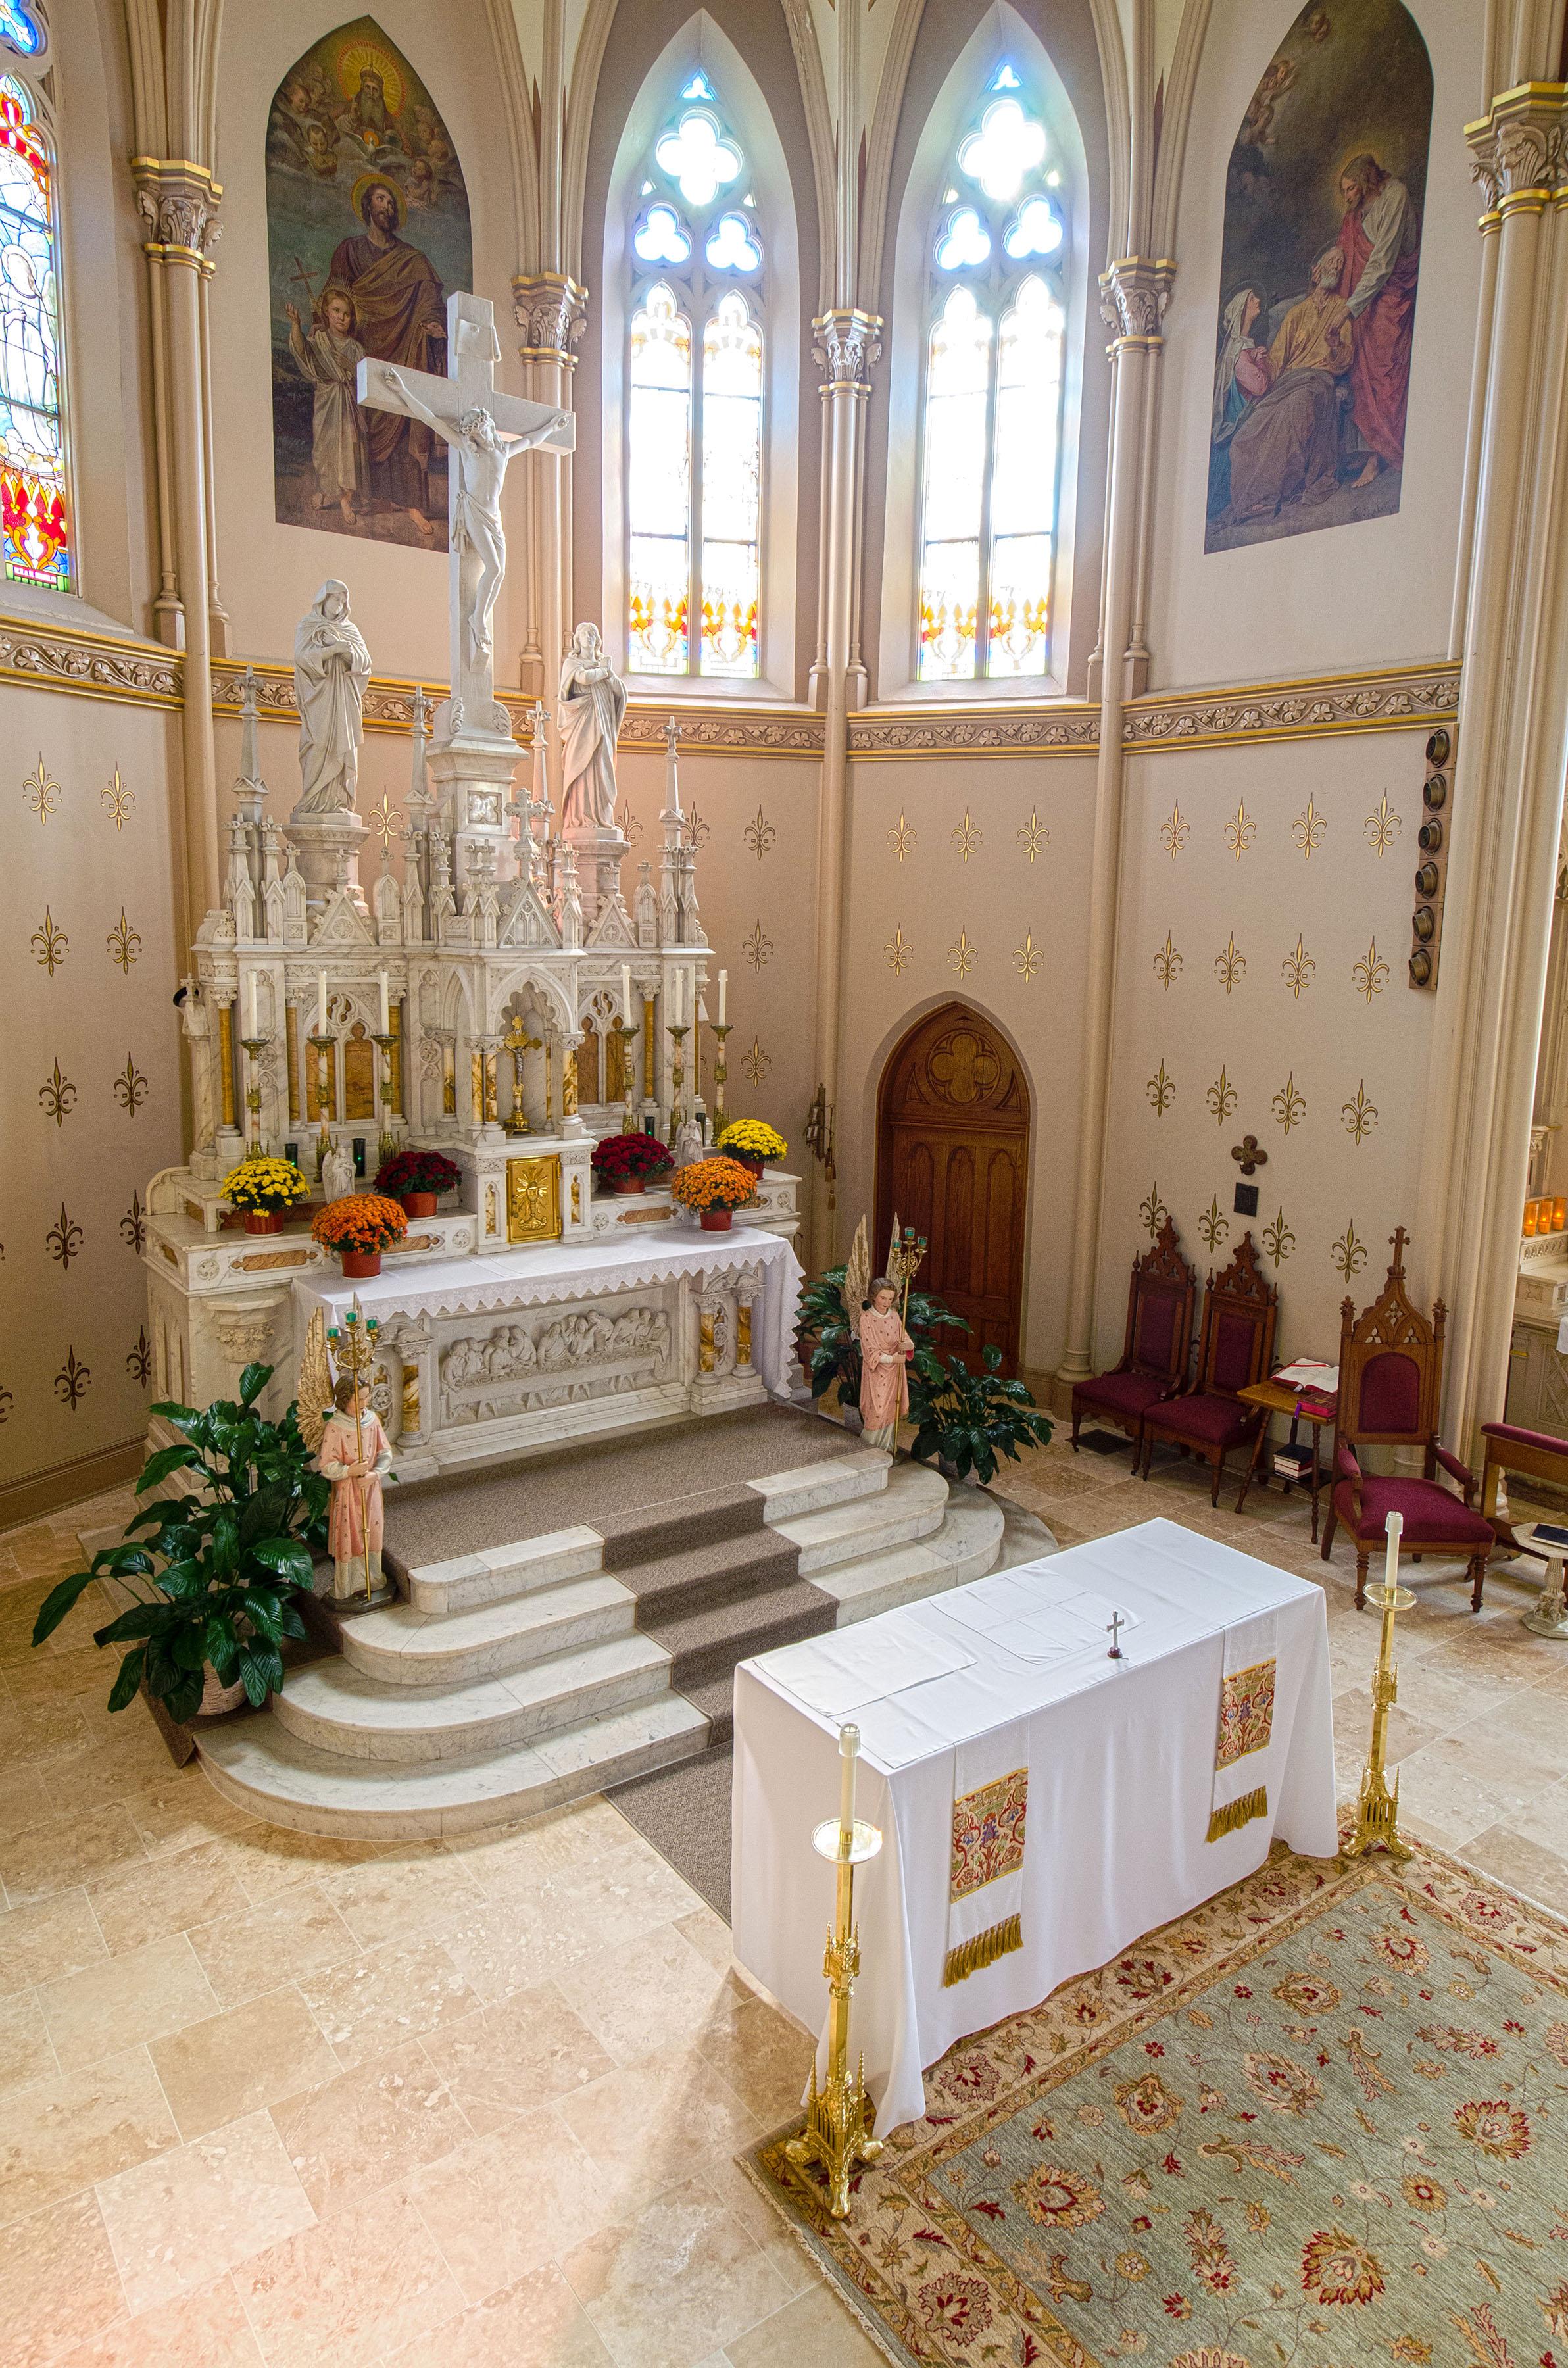 The Oldest Mishawaka Parish St Joseph